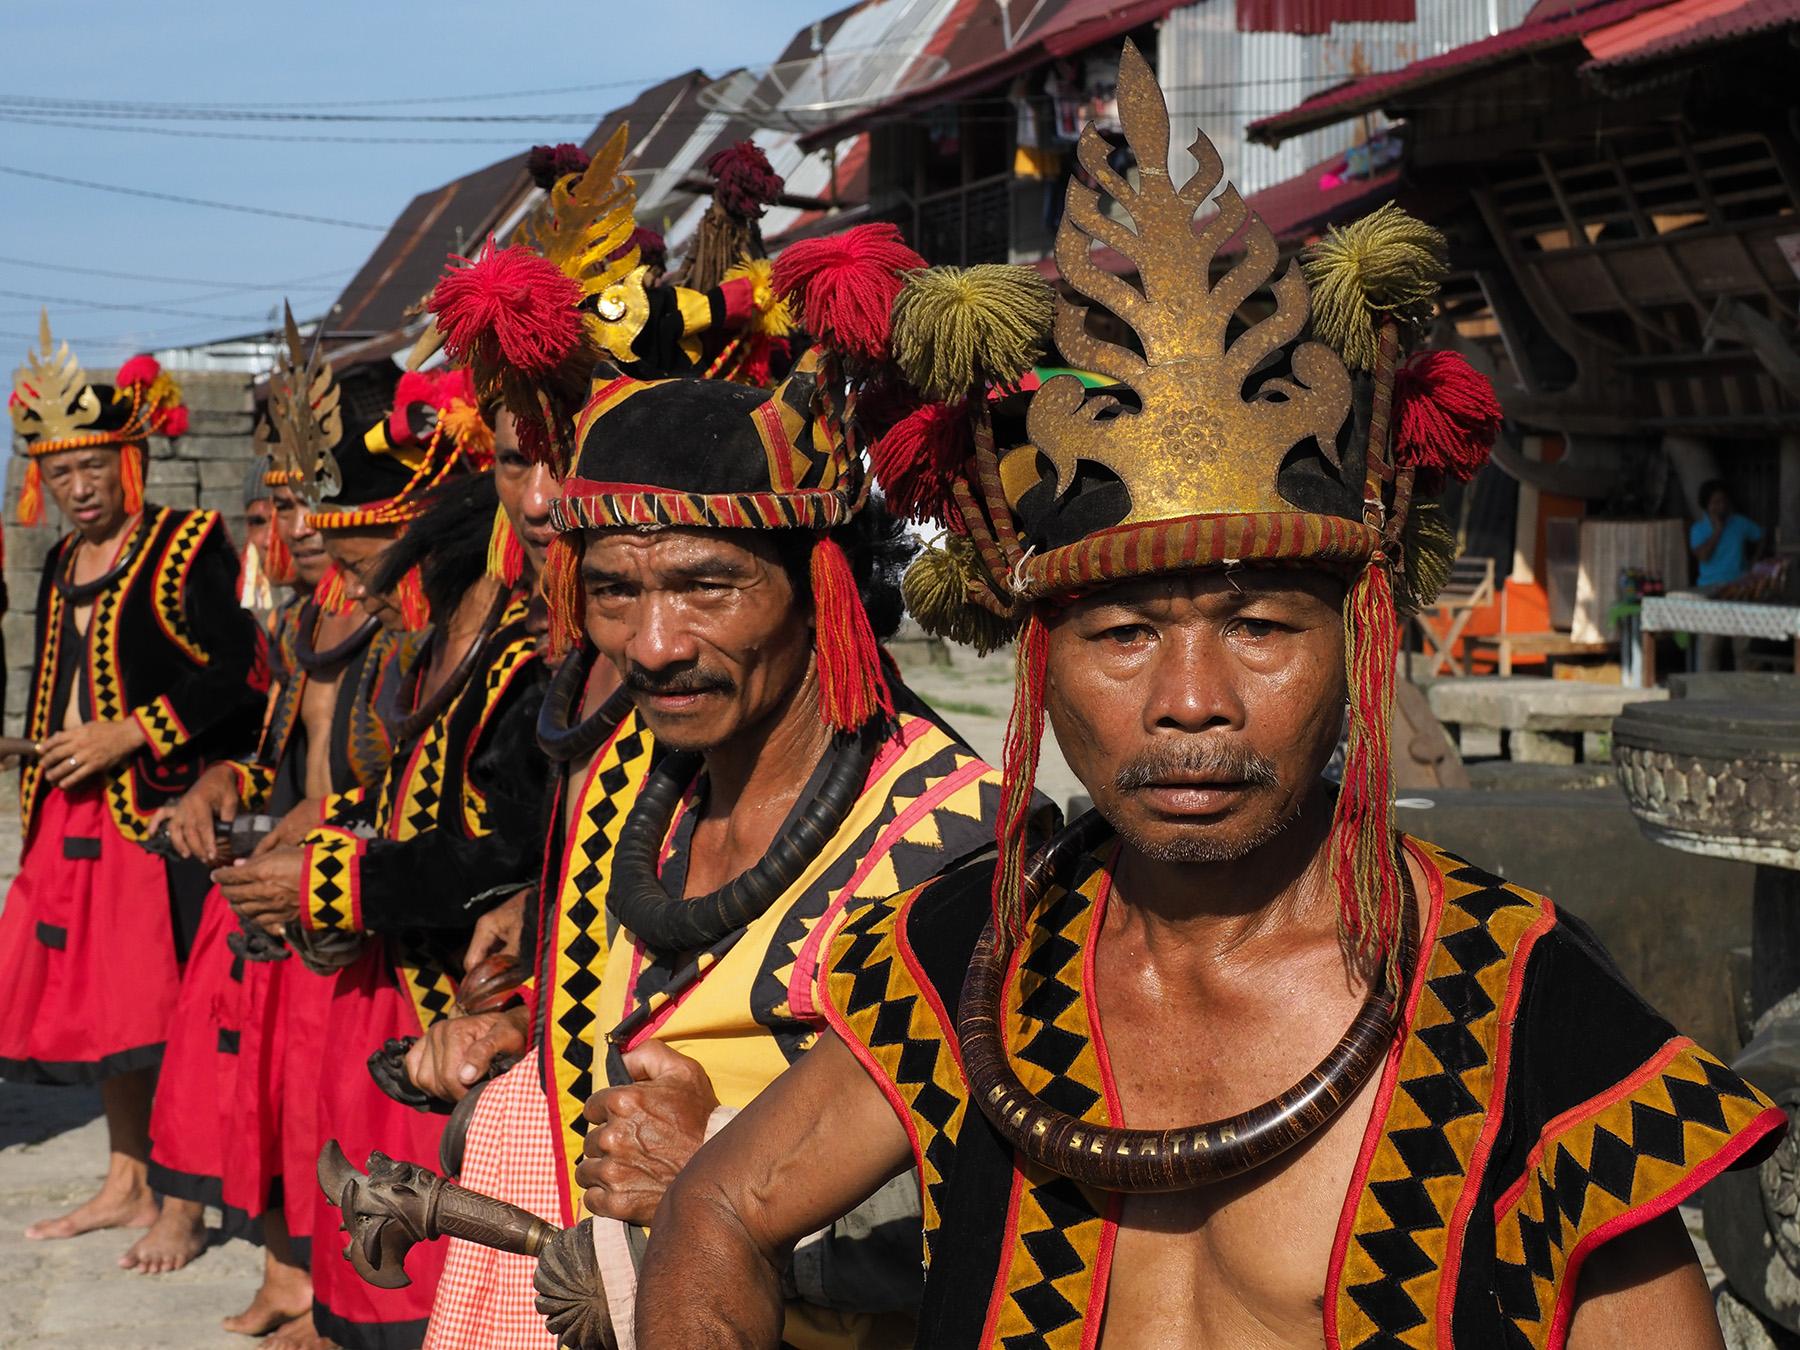 Ranjan_Ramchandani_The Nias tribalwarrior dancers.jpg